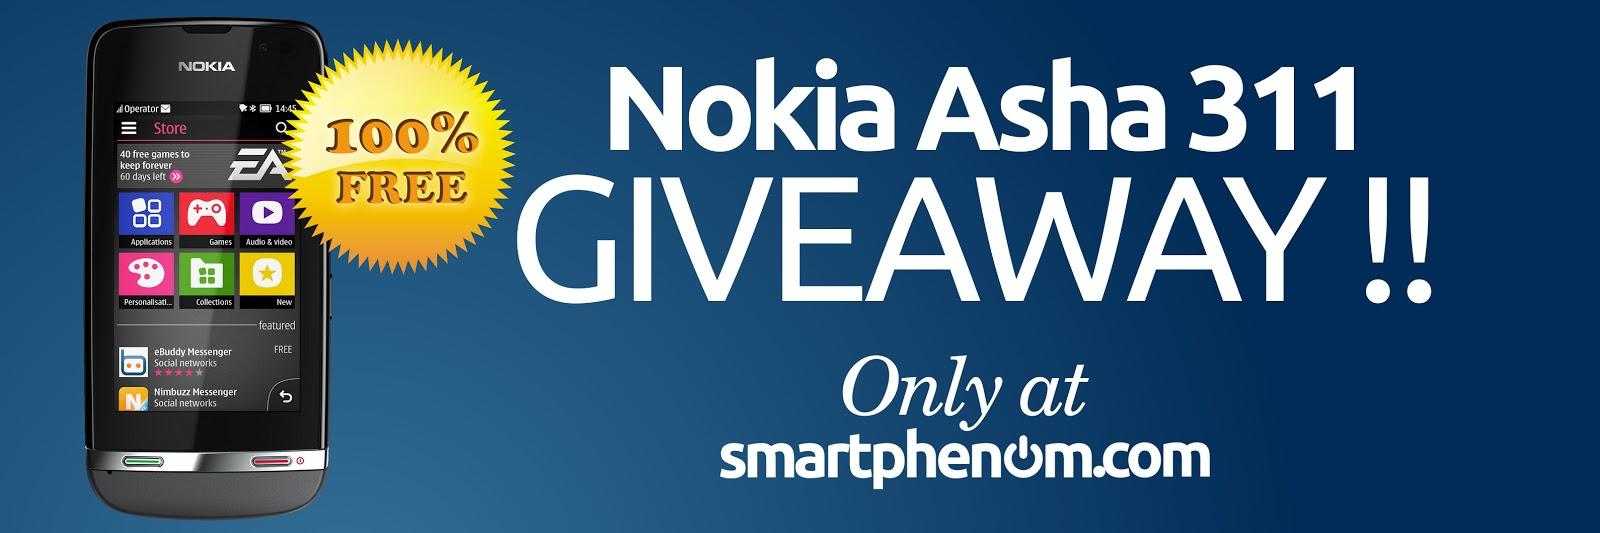 Nokia Asha 311 Giveaway